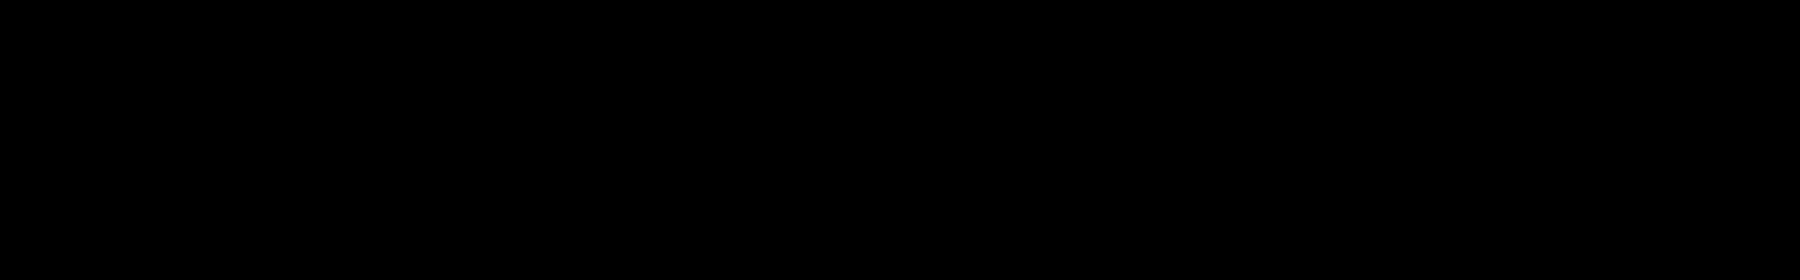 Cobra audio waveform